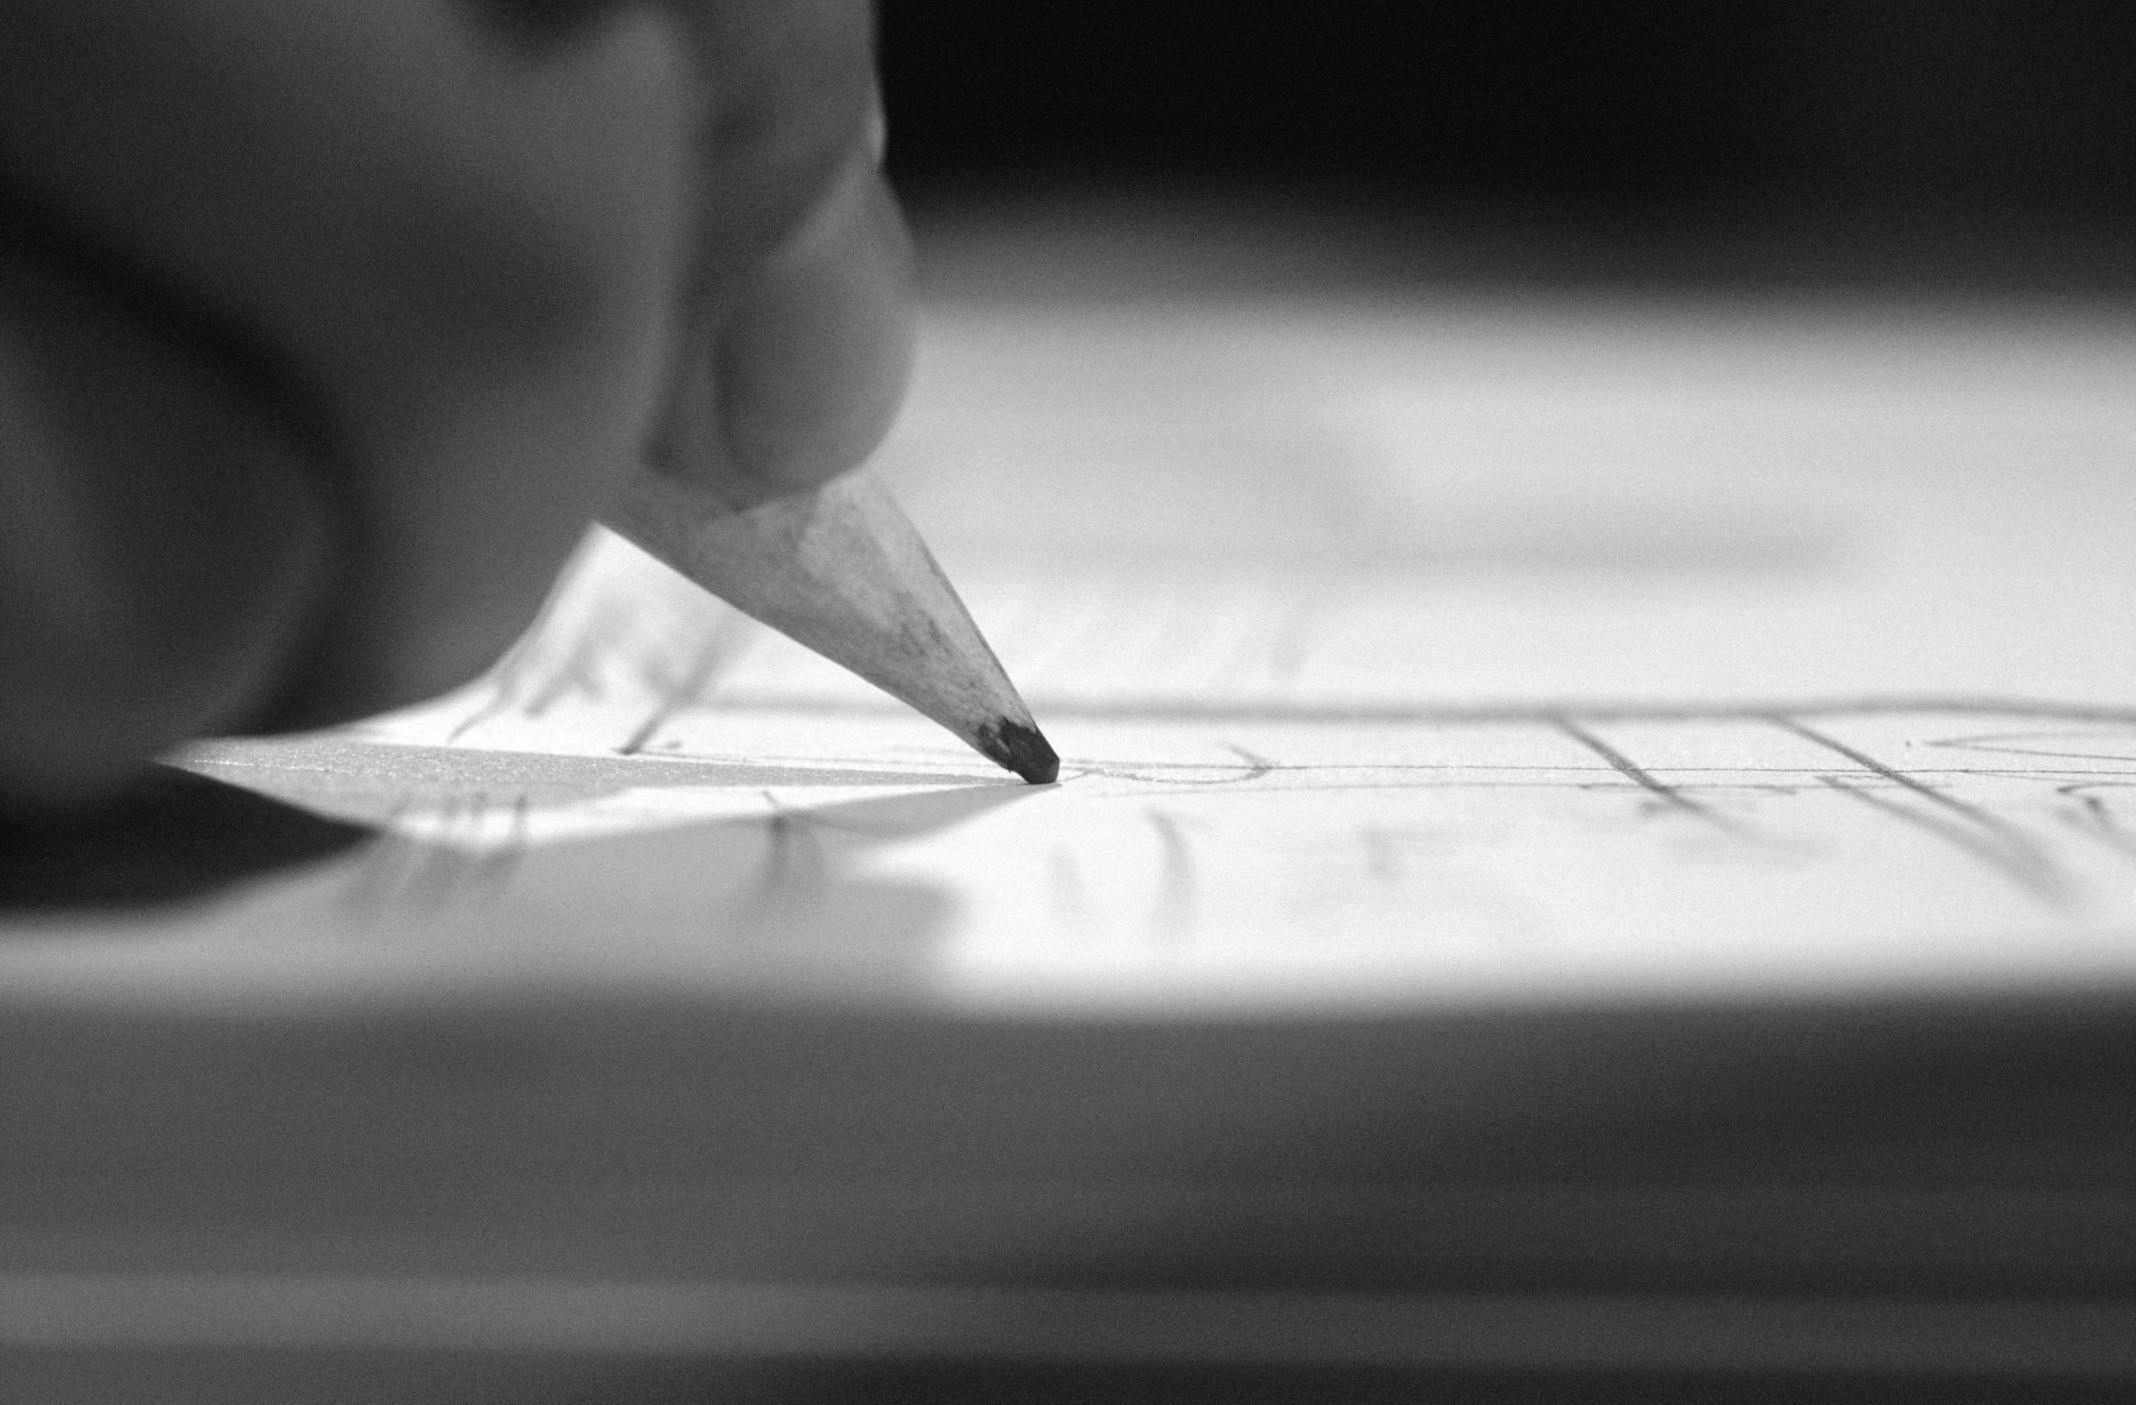 Professional essay writer toronto